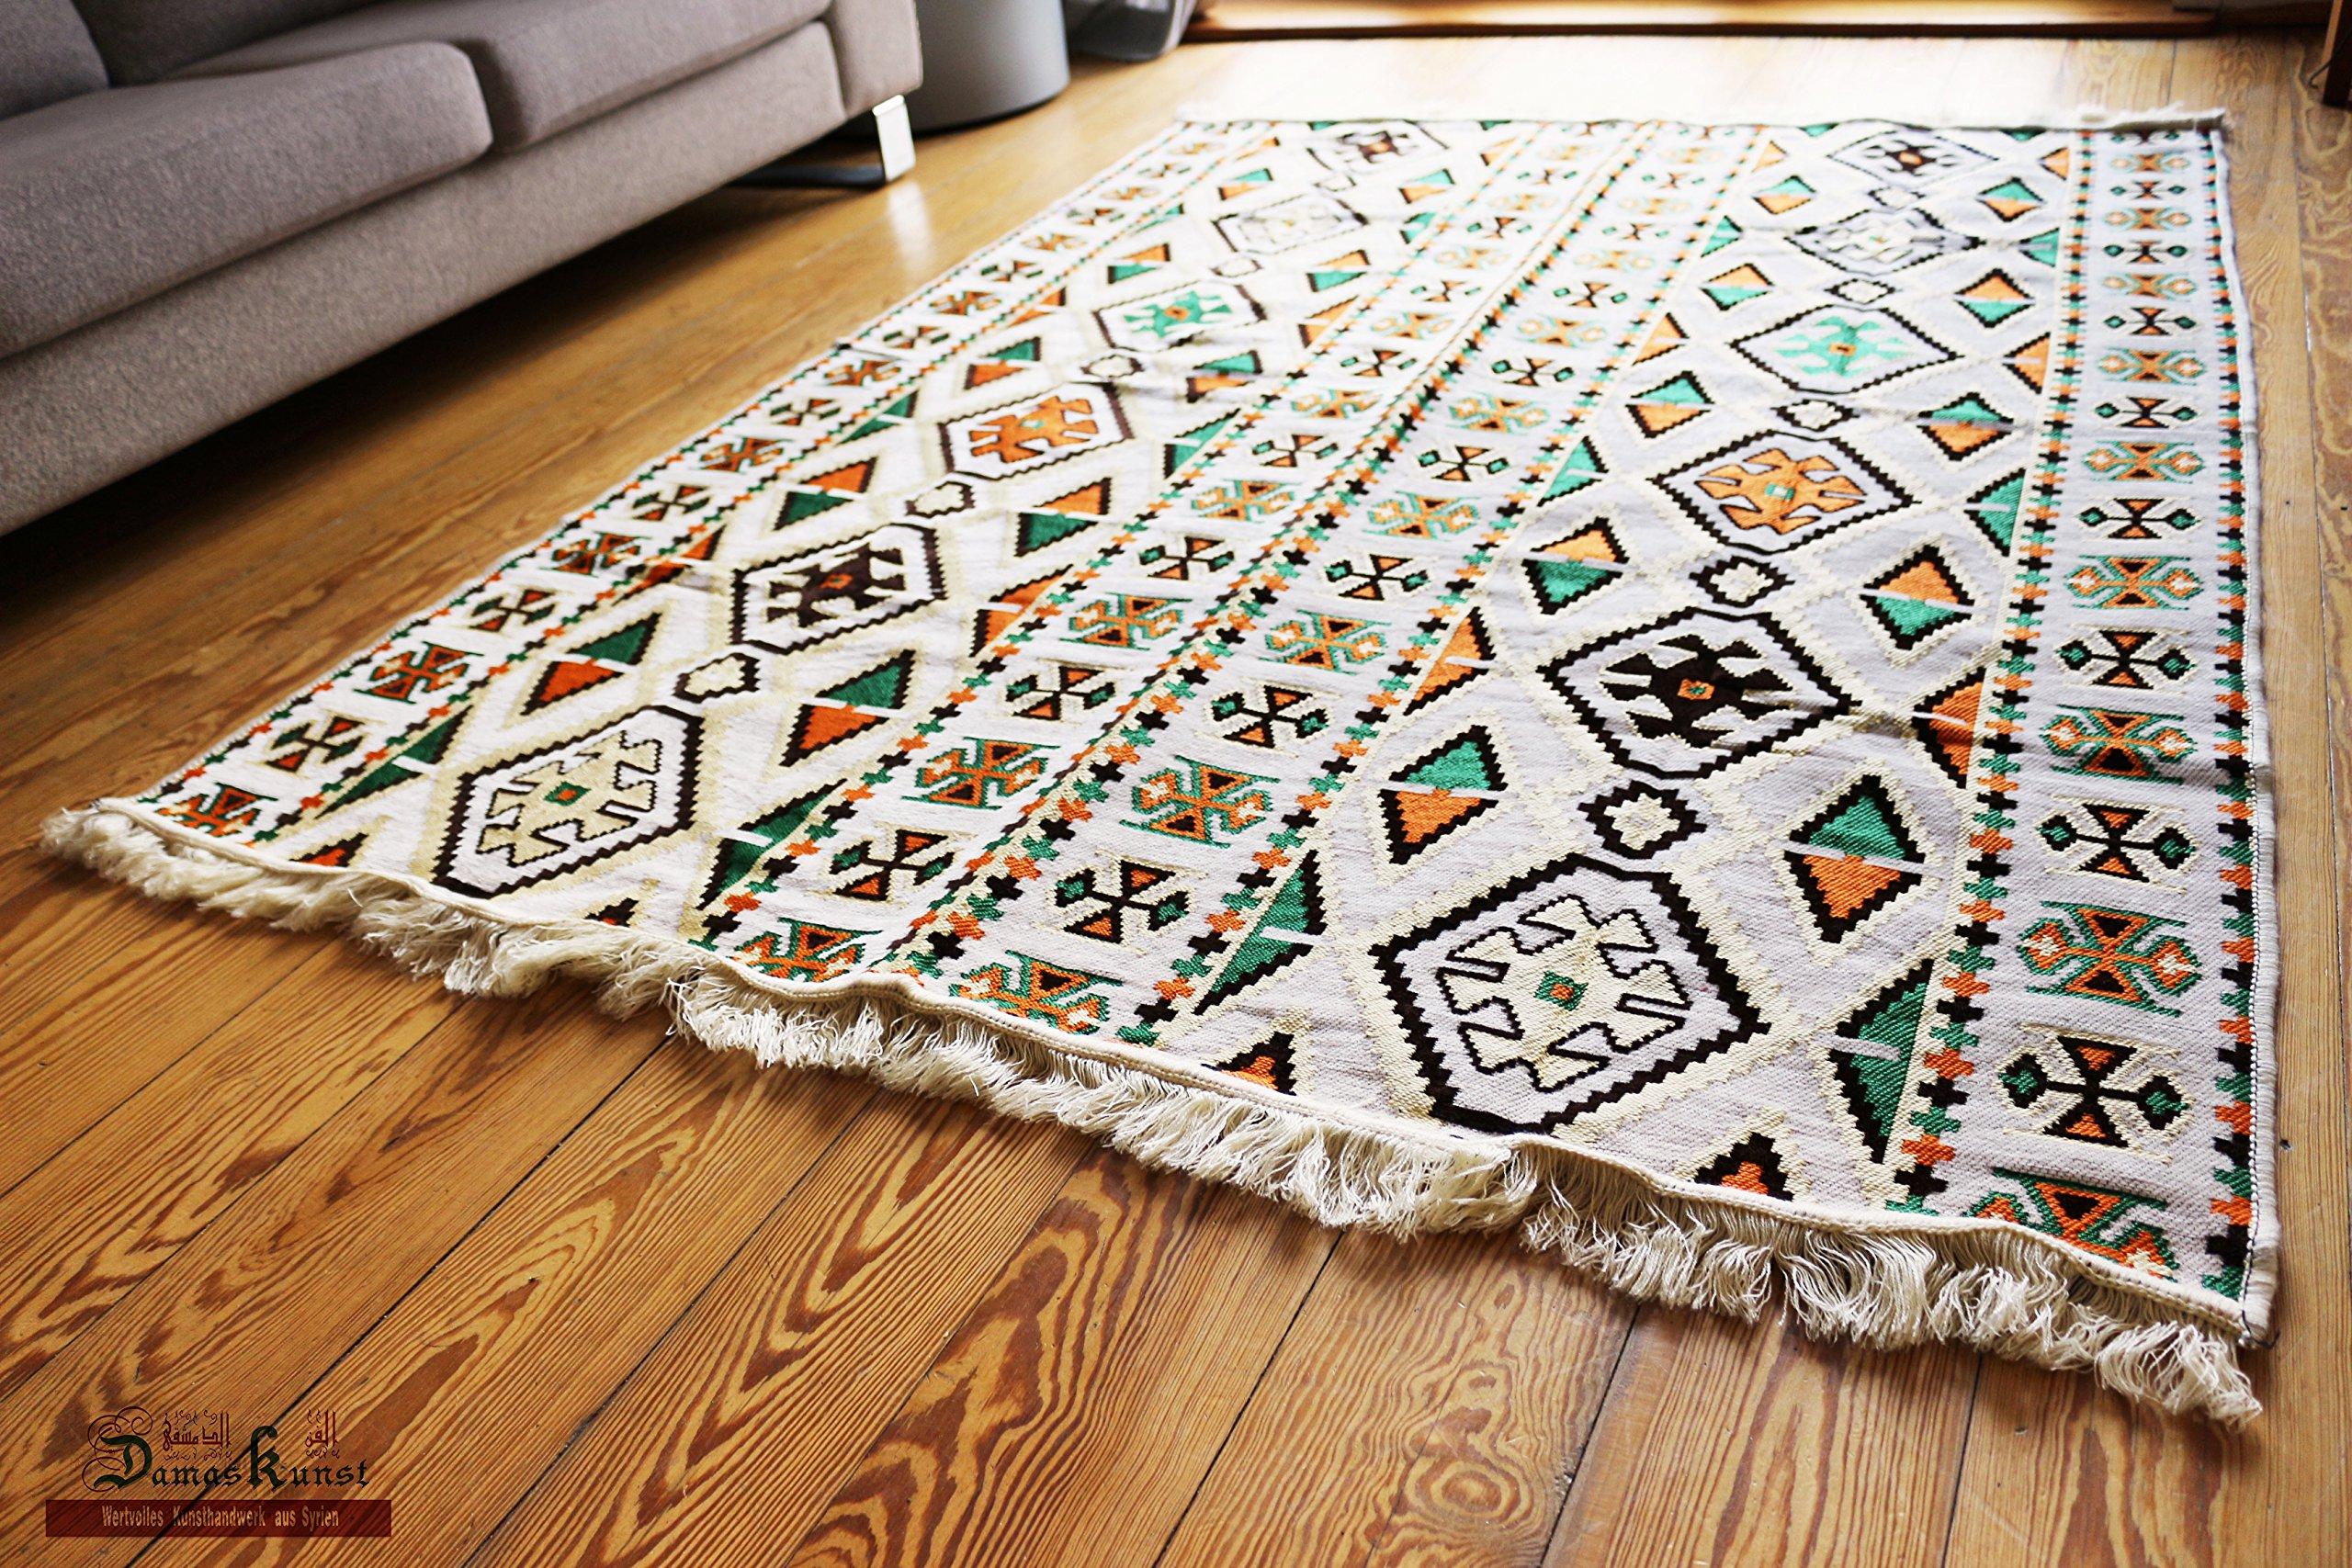 Chehade GmbH Carpet 135x200 cm, Oriental Carpet Kilim Rug Kelim/Floor Mat,Tapestry wall hanging,Floor runner, Area Rug, Rugs,Teppich,Läufer,Tapis,Tapiz,alfombra S 1-4-43